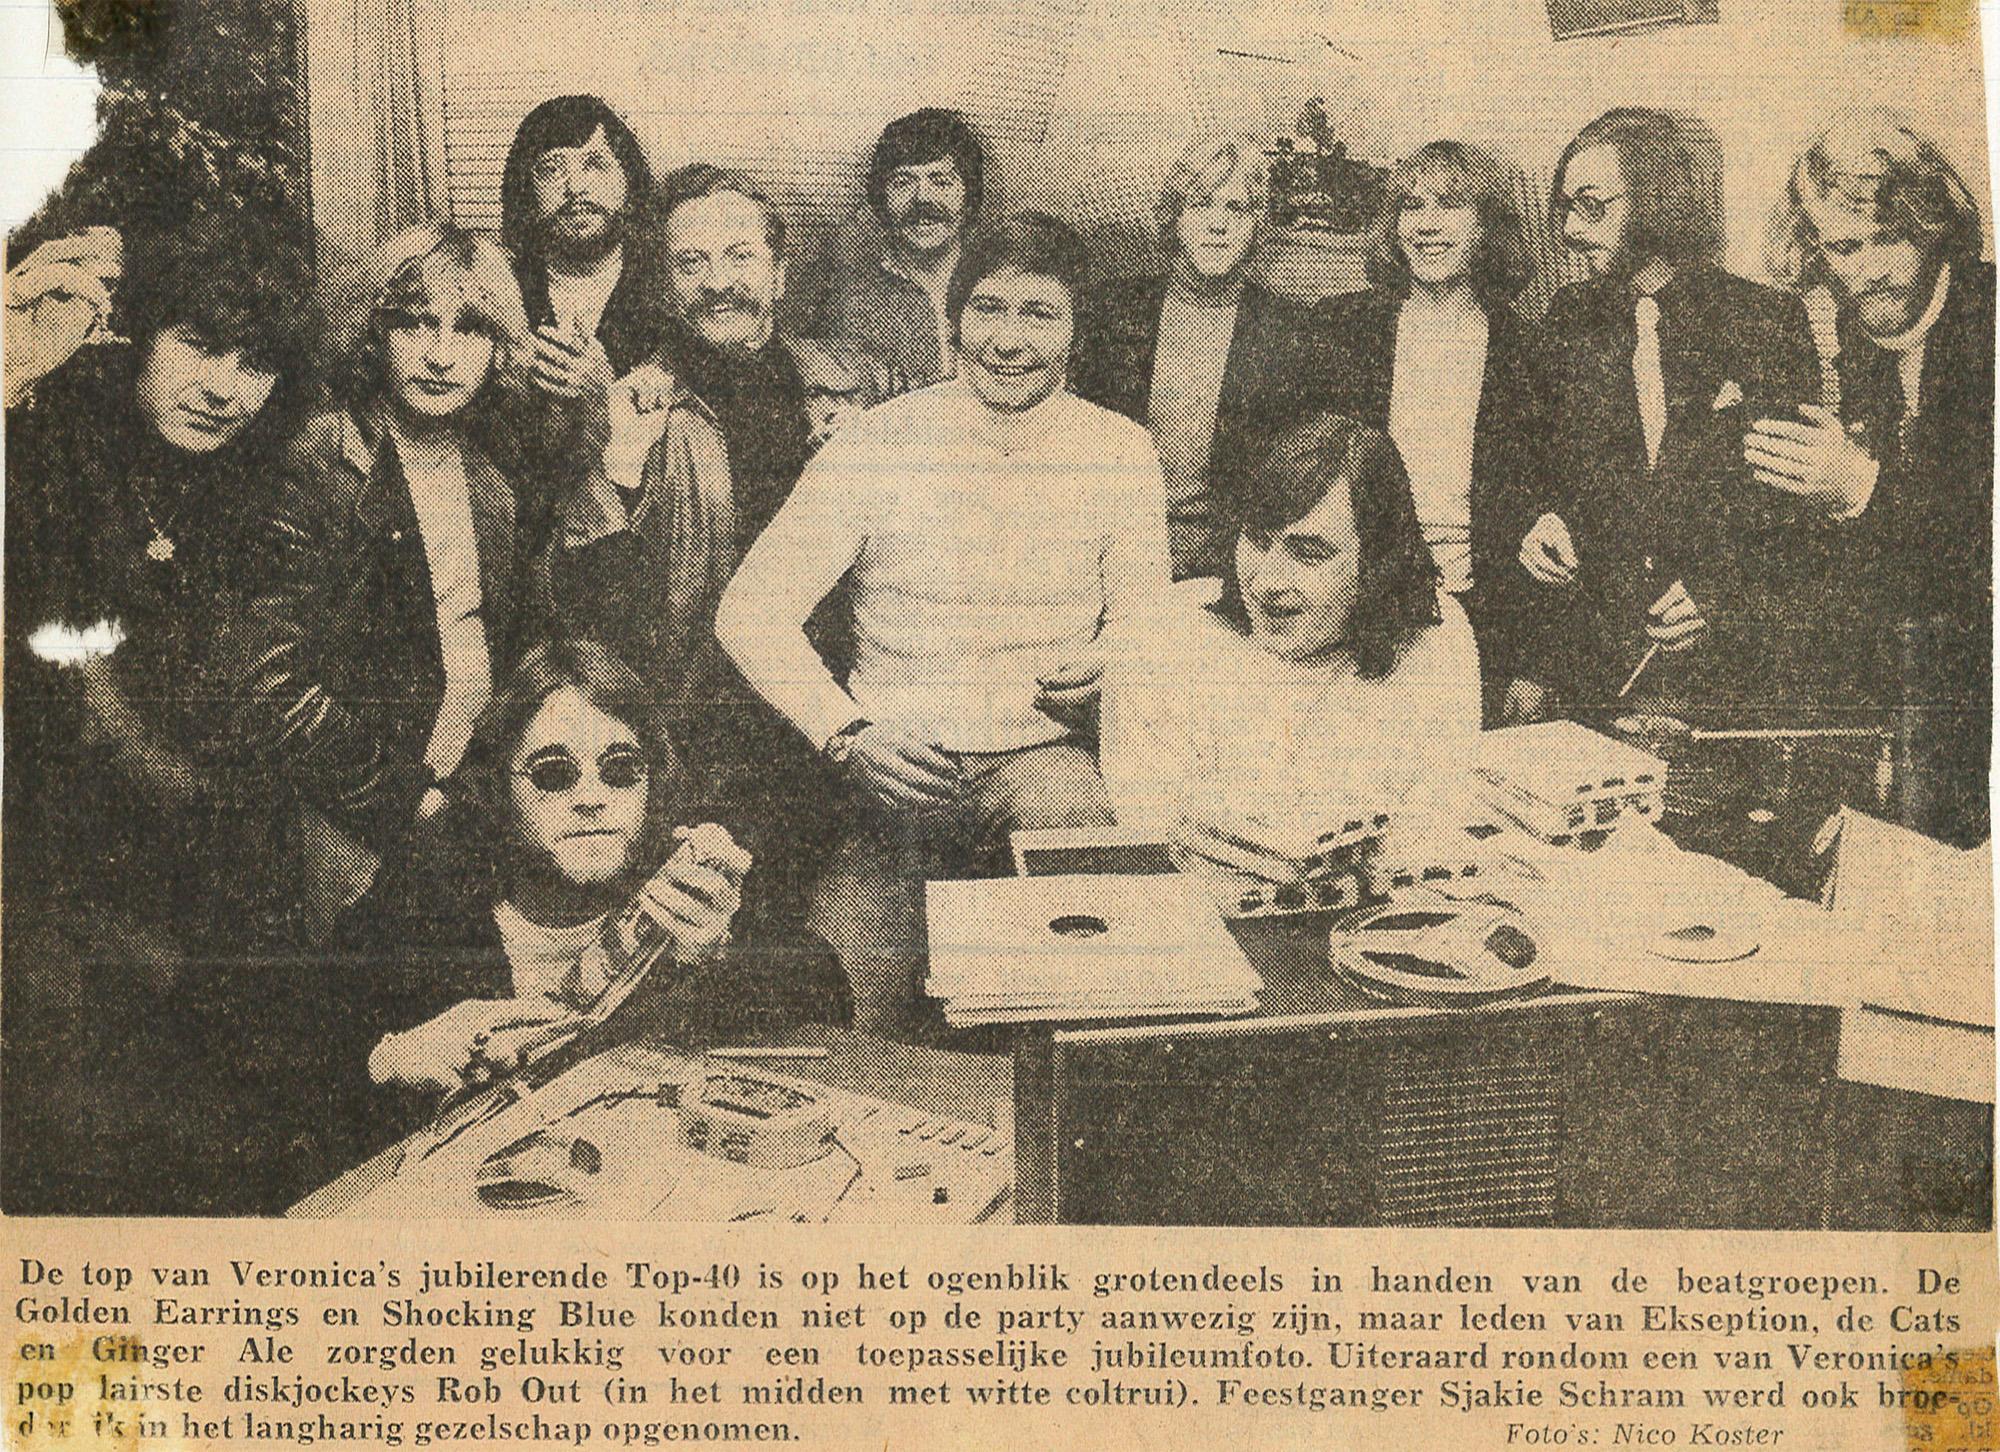 1970_Vrije_Volk_Top40_jubileum.jpg